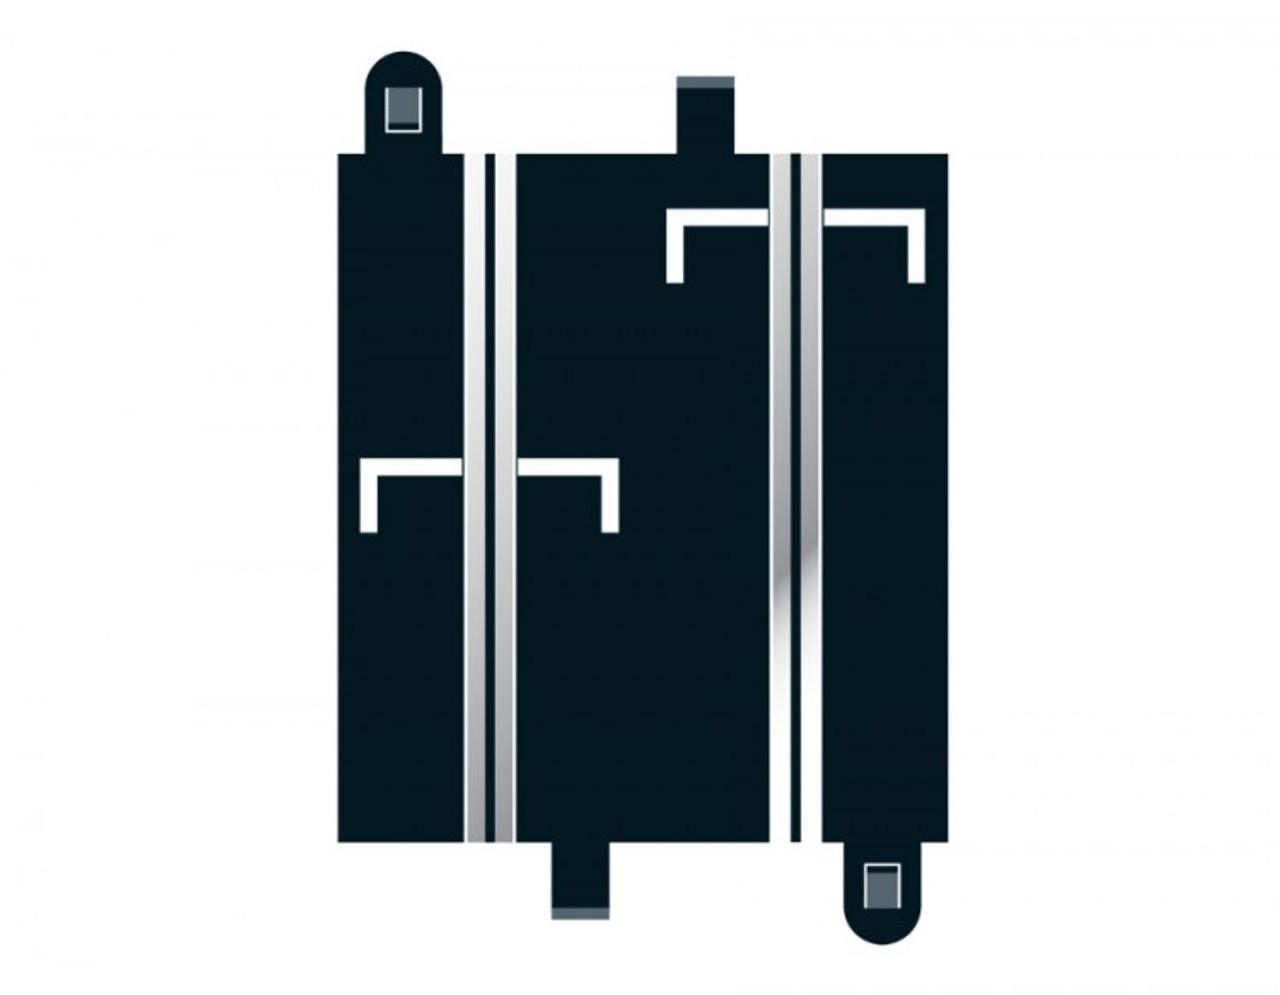 Scalextric C7018 Starter Grid (2) Slot Car Accessories 1:32